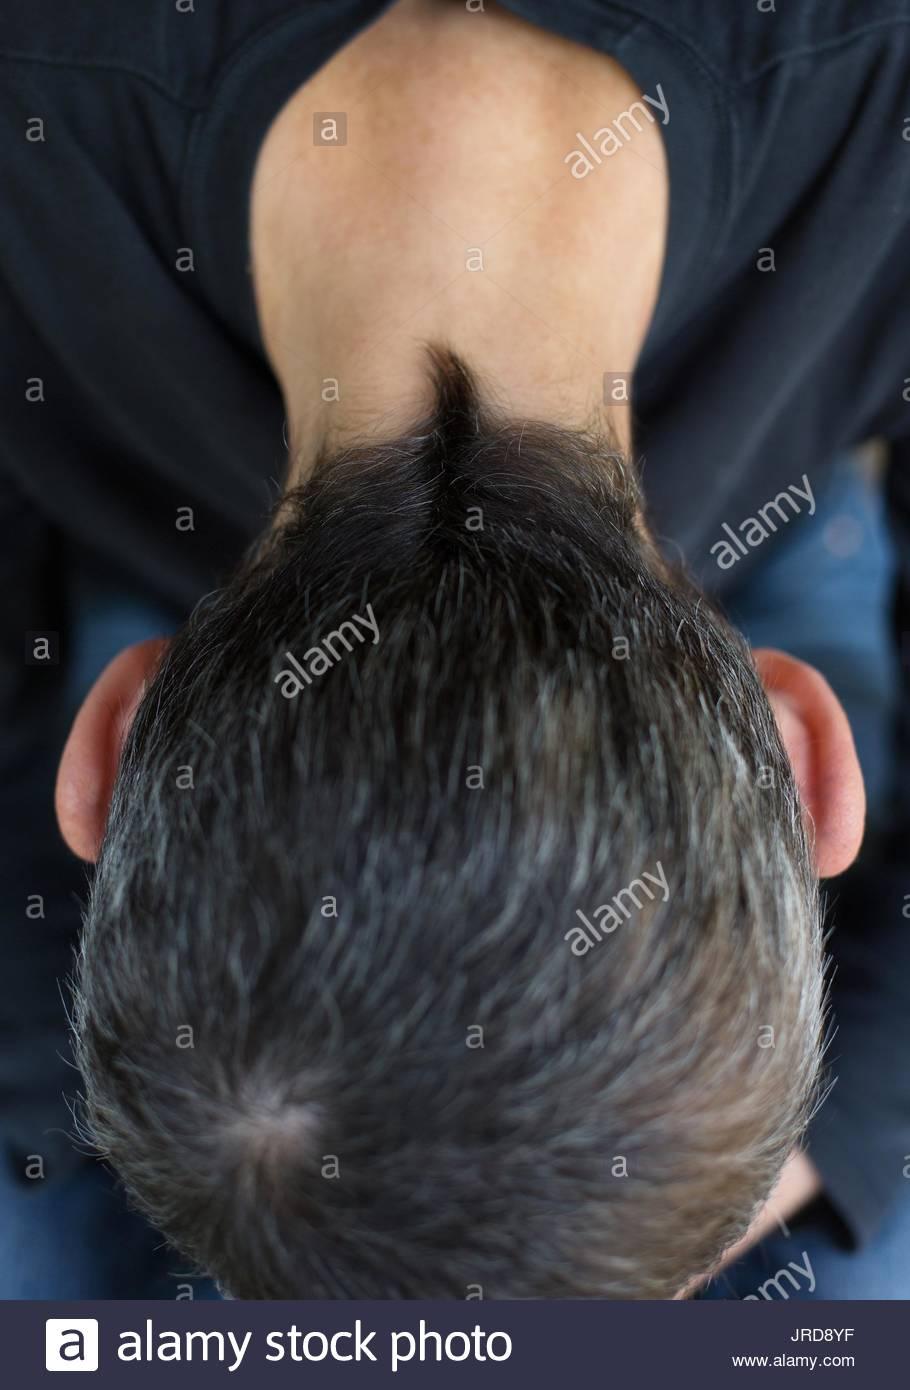 Frauen Mit Kurzen Haaren Nackt